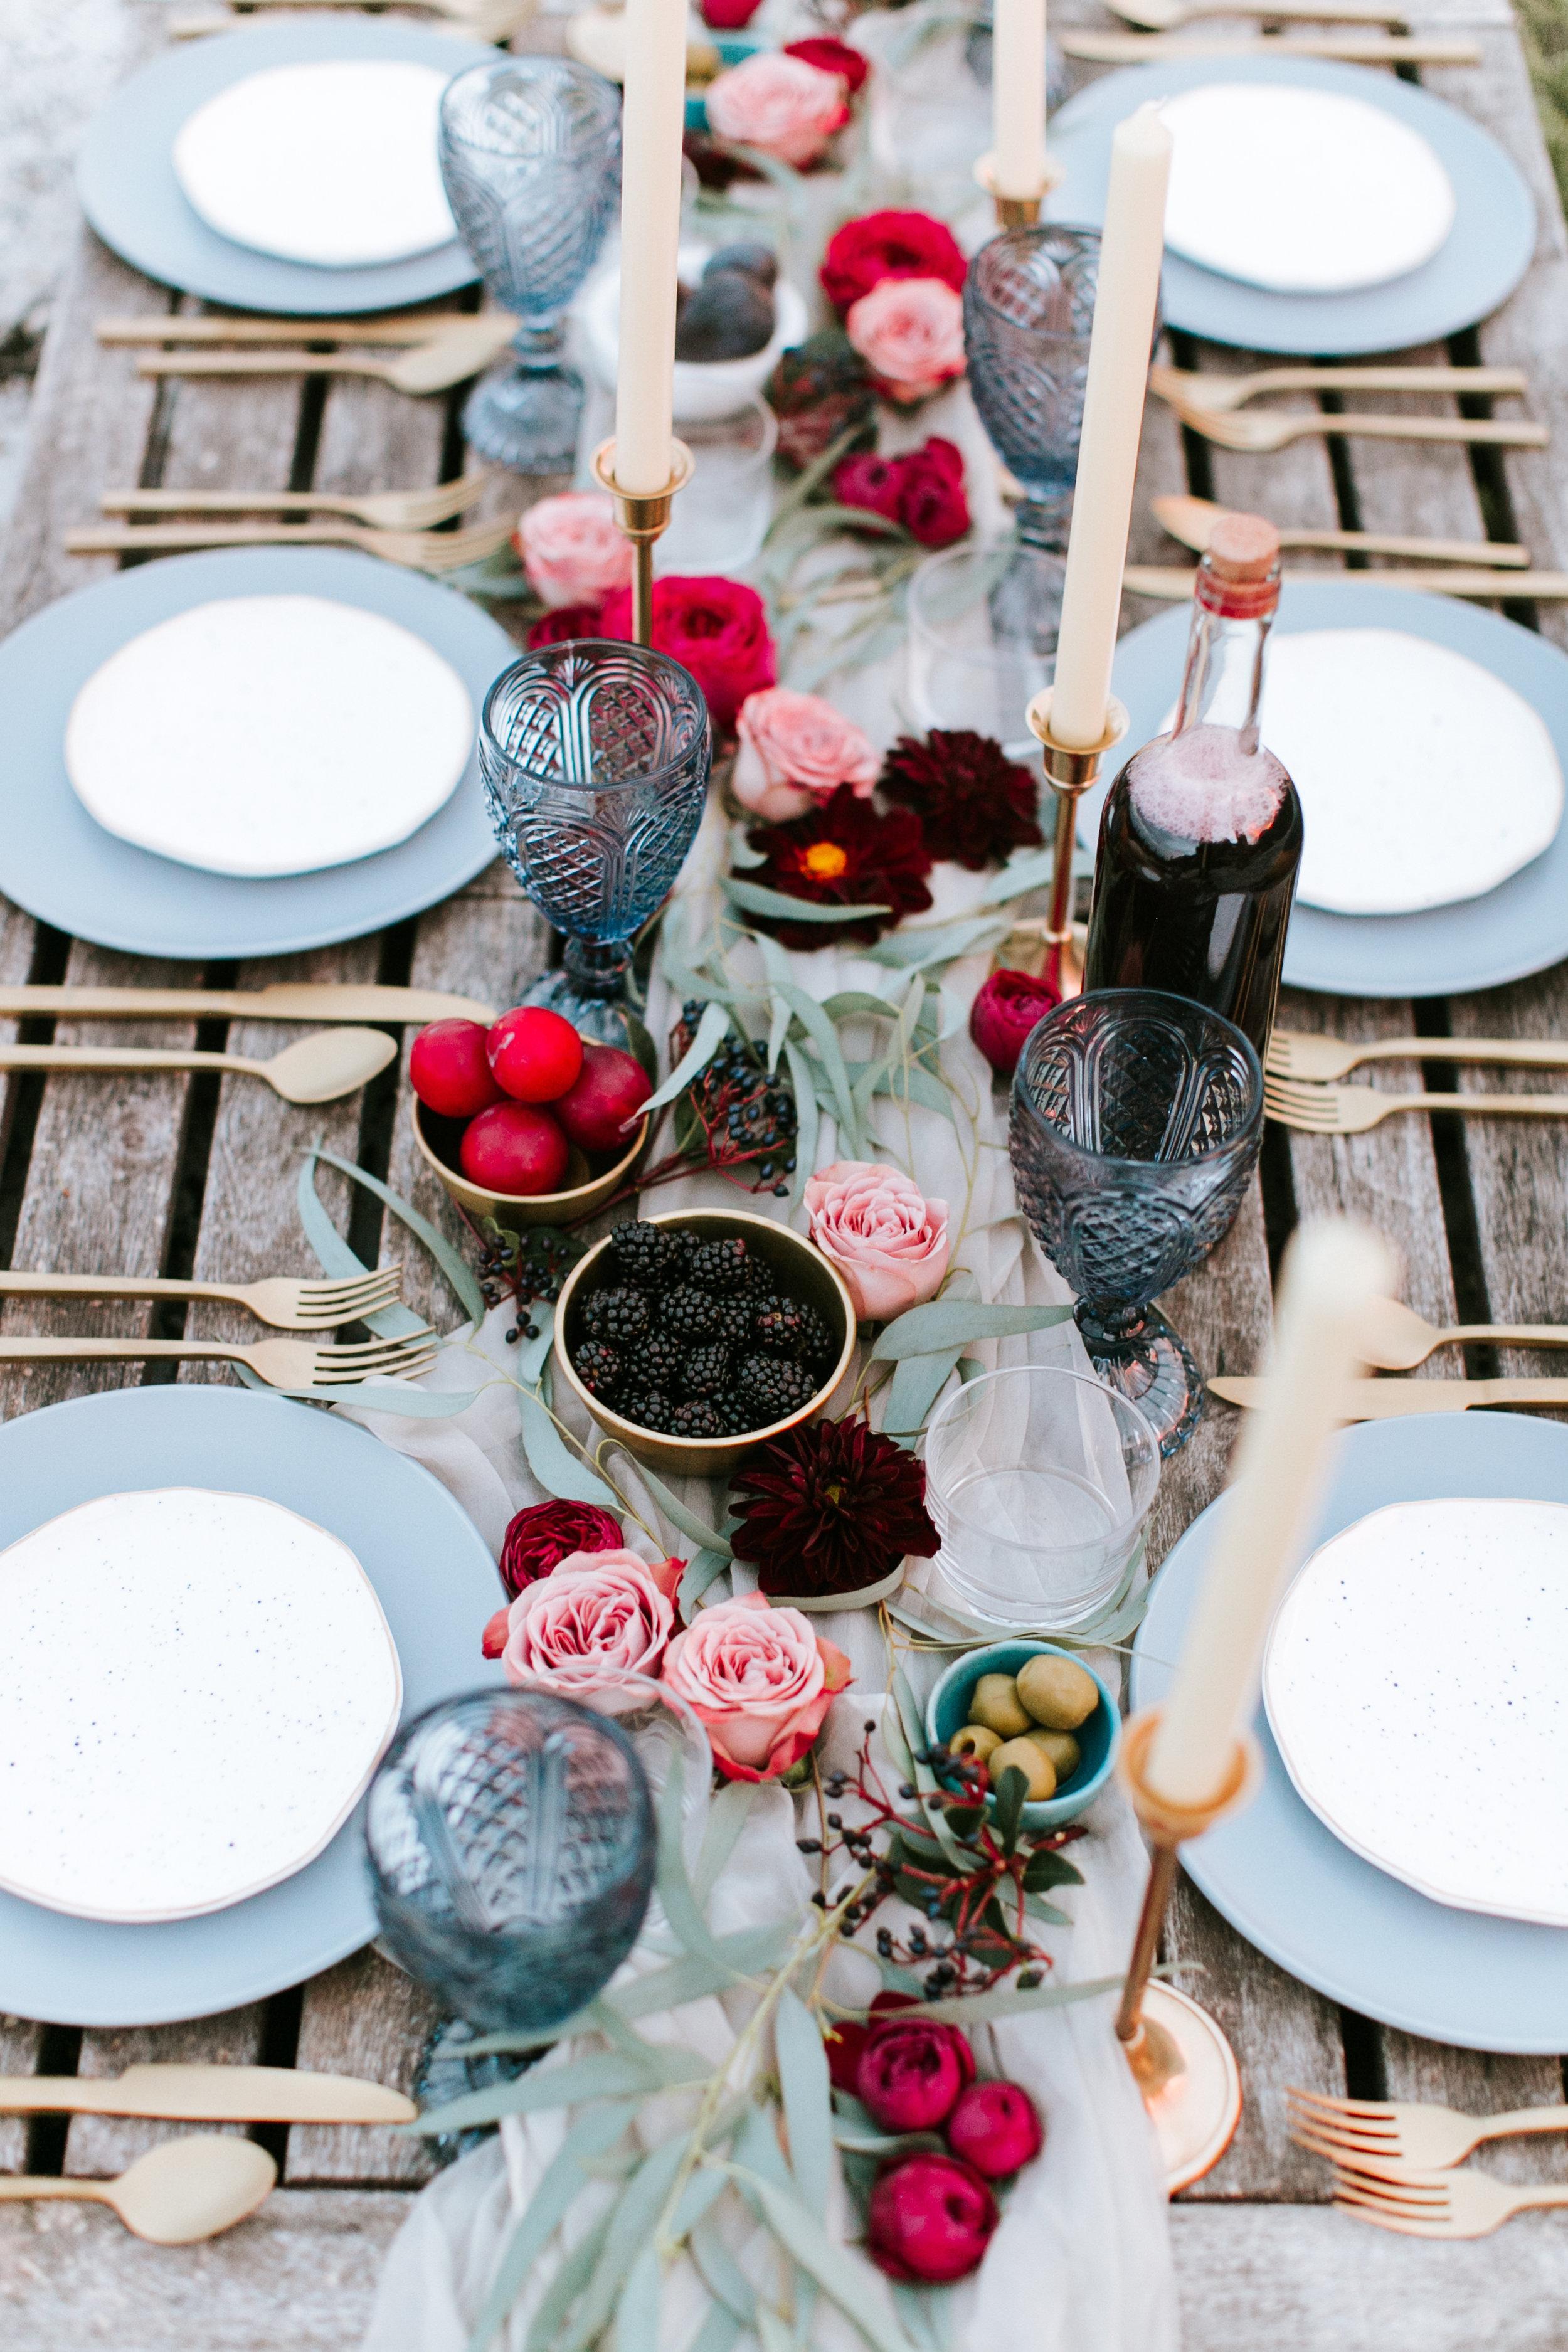 Junebug Weddings: Intimate Mountain Top Inspiration. Click for more.